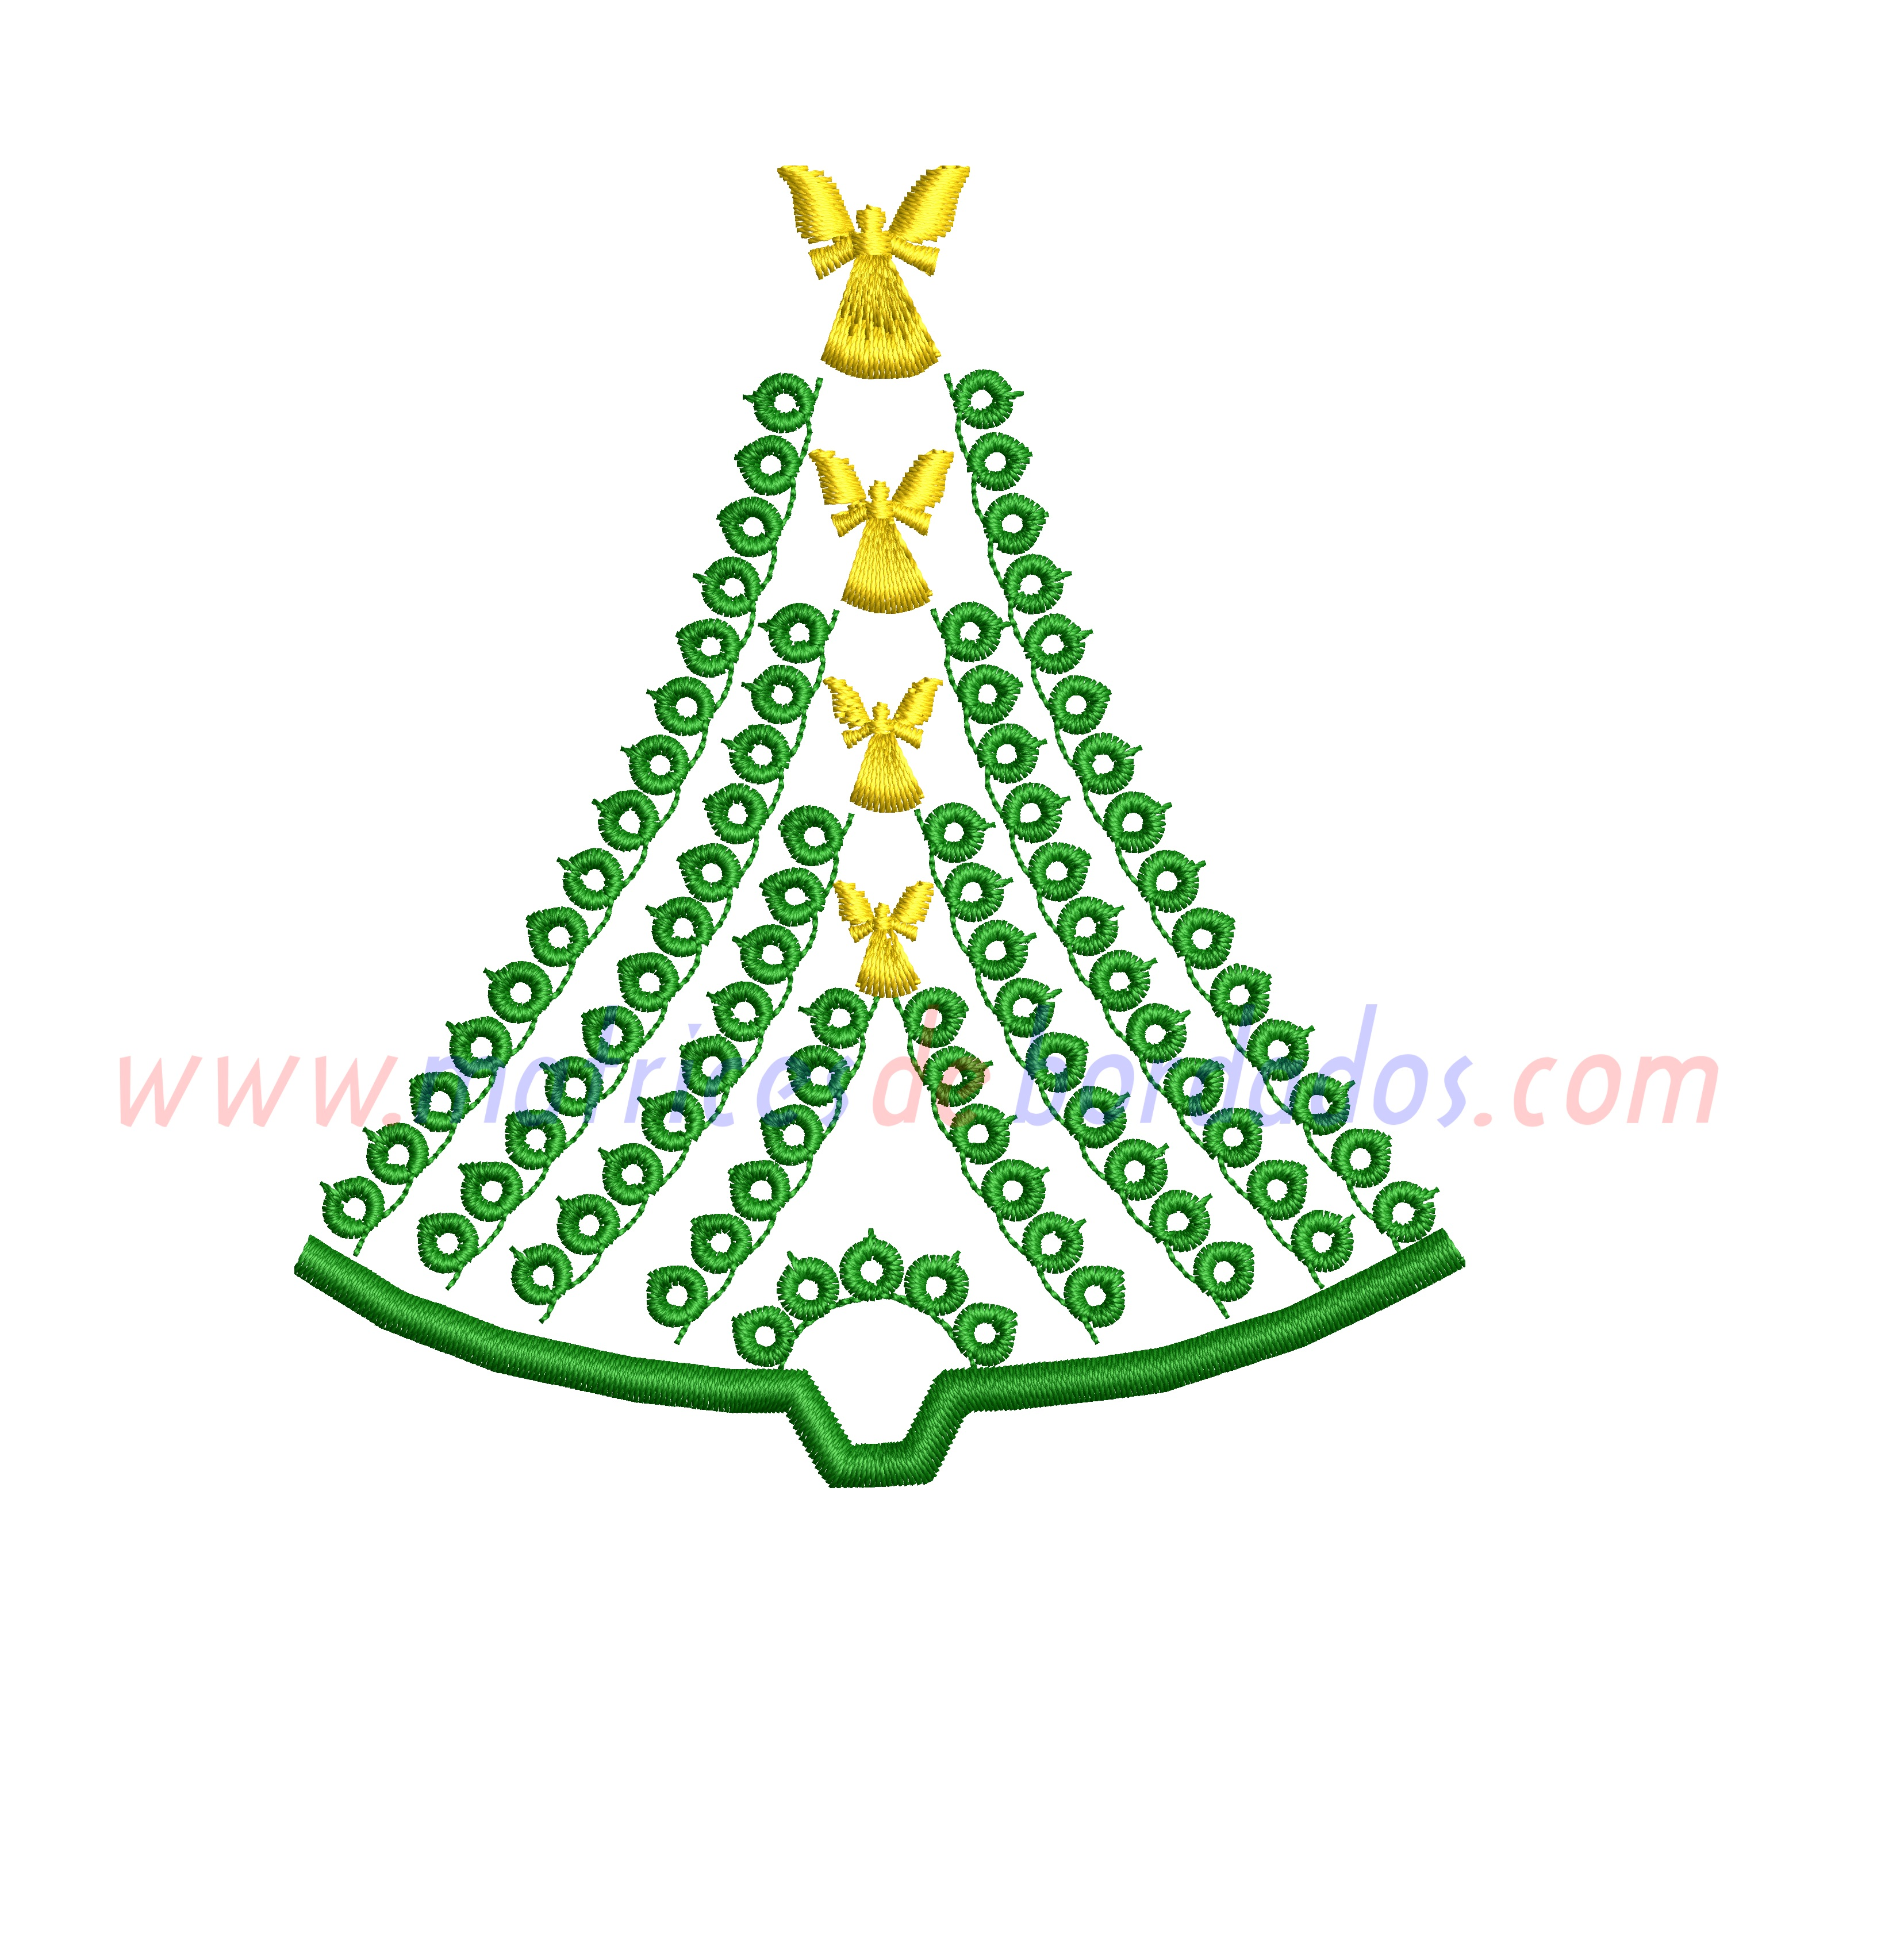 KH69CE - Arbol de Navidad